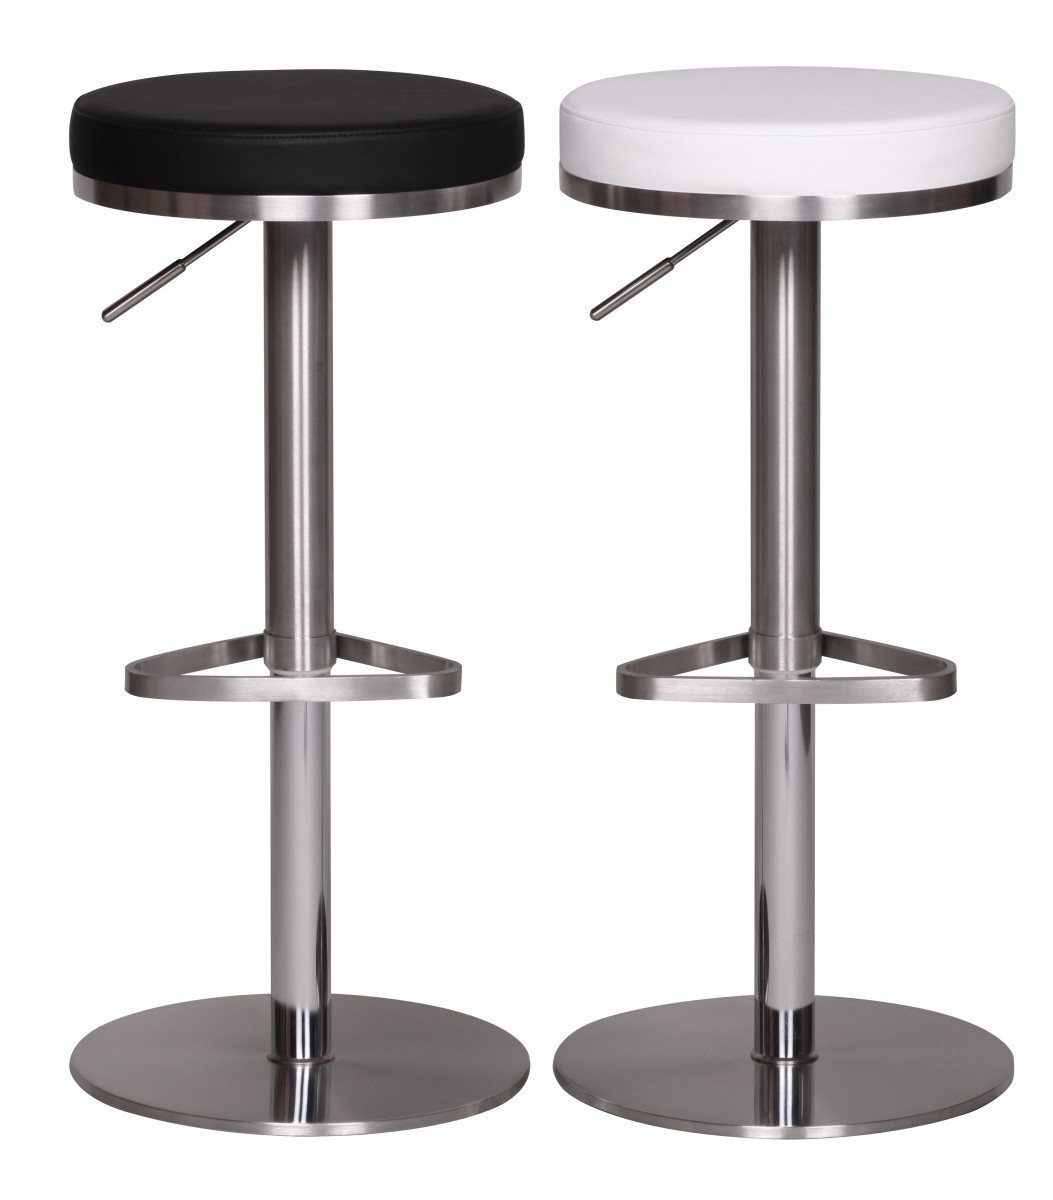 wohnling durable m7 barhocker edelstahl schwarz barstuhl modern hocker verstellbar design. Black Bedroom Furniture Sets. Home Design Ideas